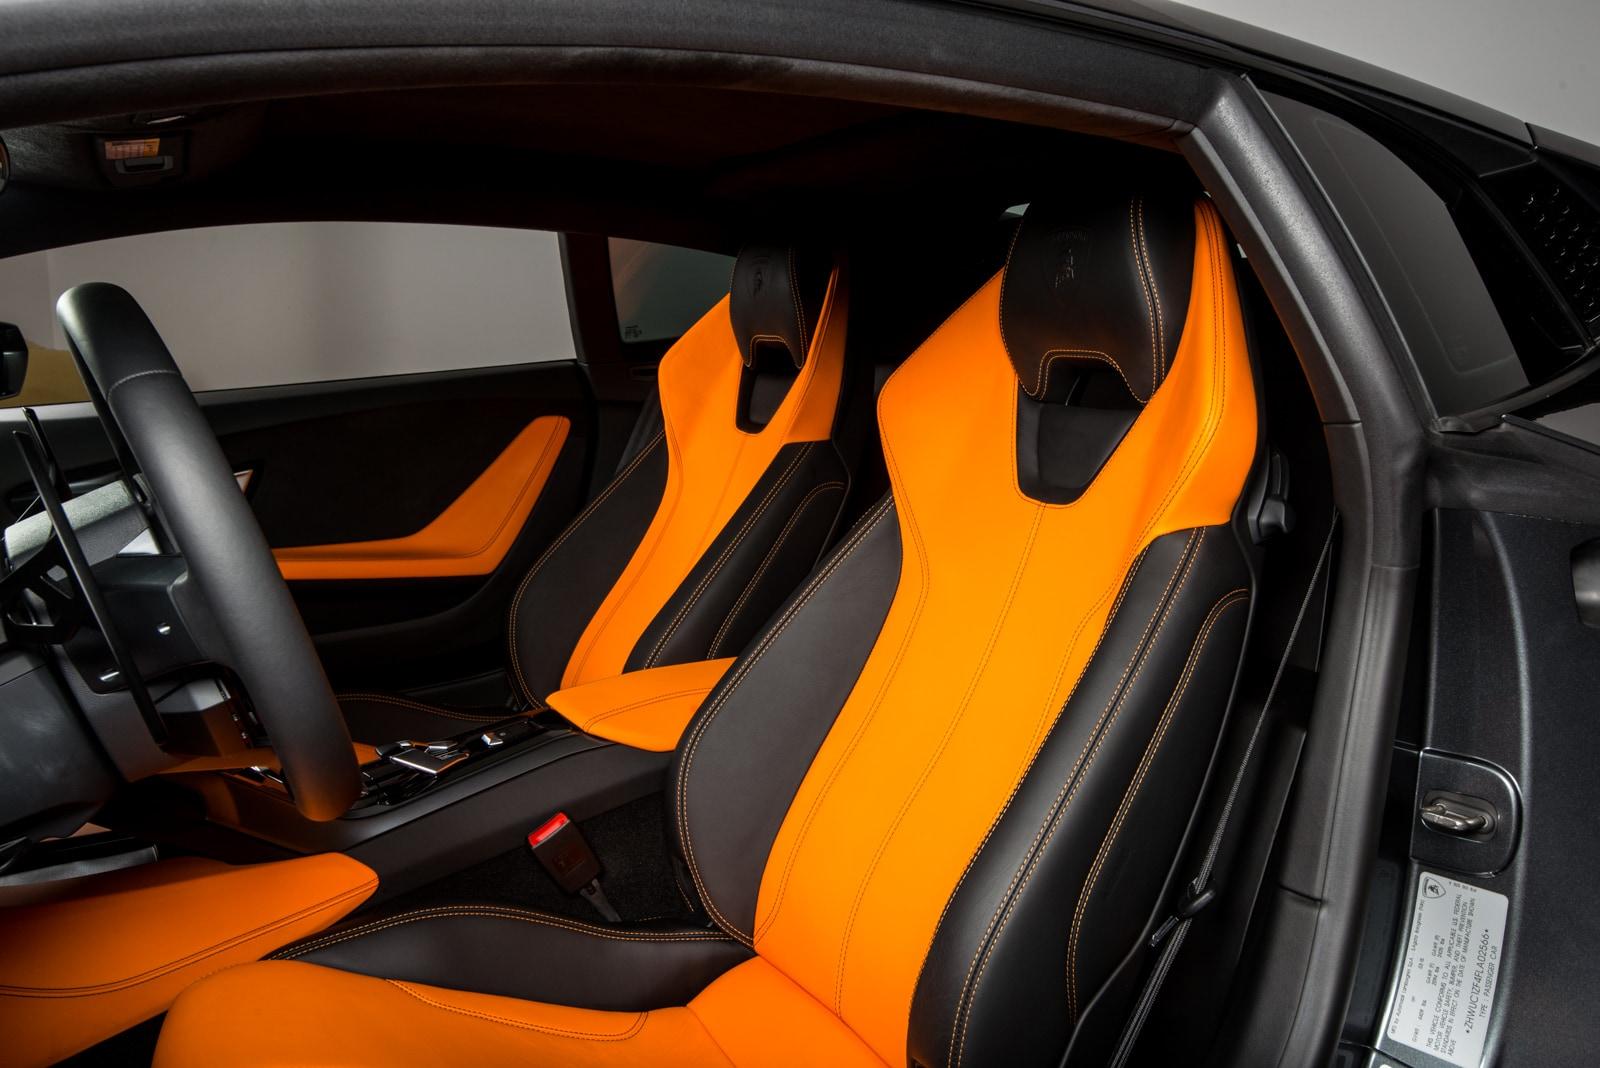 2015 lamborghini huracan lp 610 4 coupe for sale in plainview ny at maserati